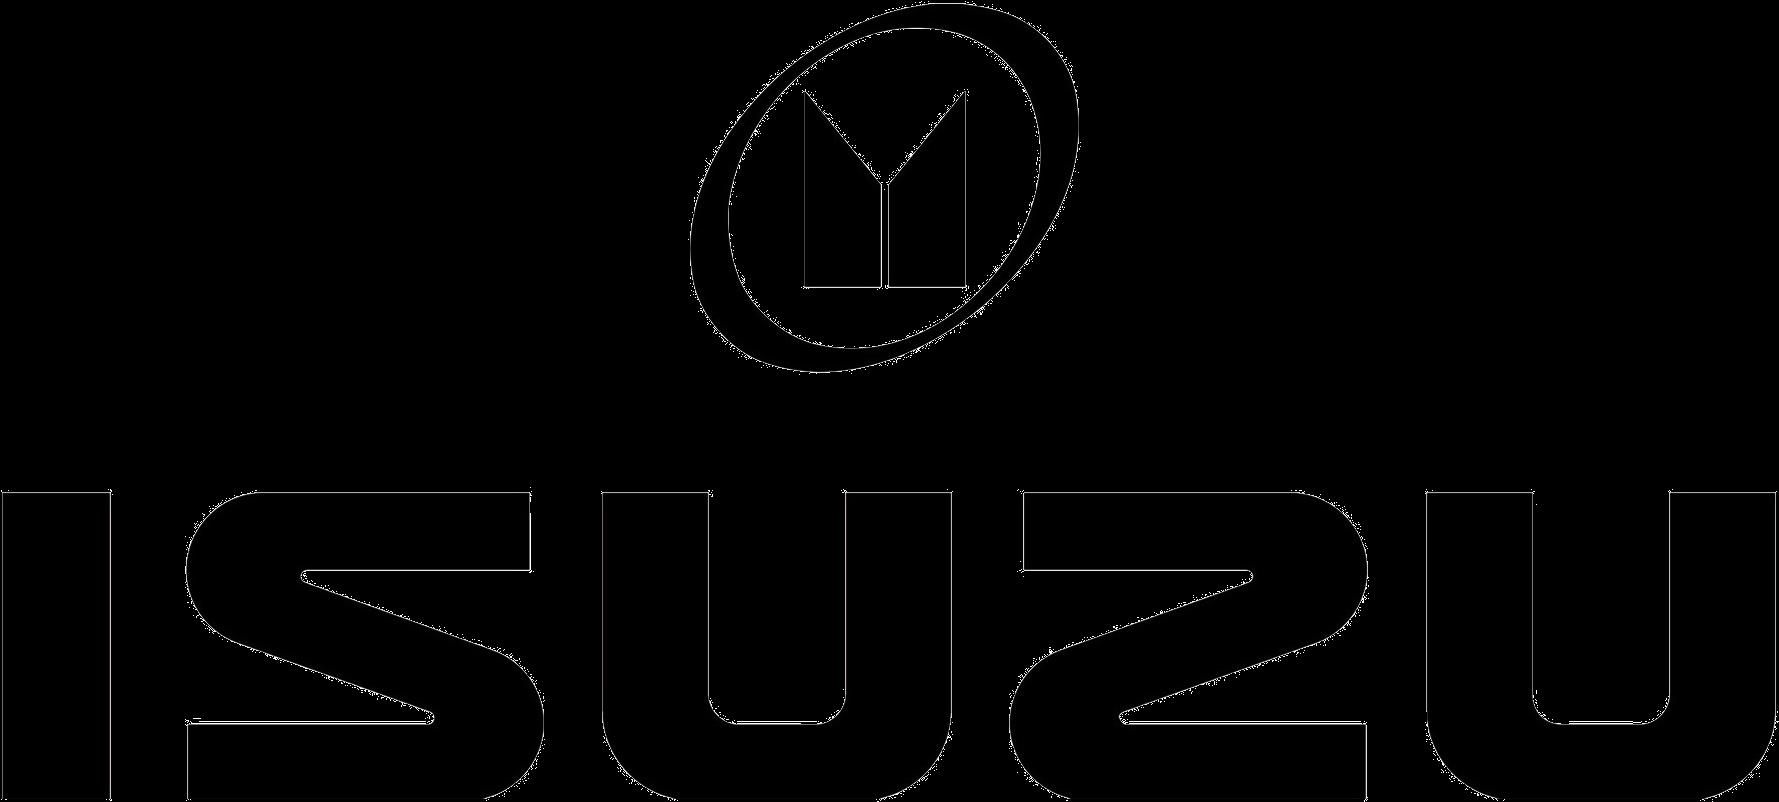 Isuzu Logo Hd Png Meaning Information Carlogos Org Clipart.